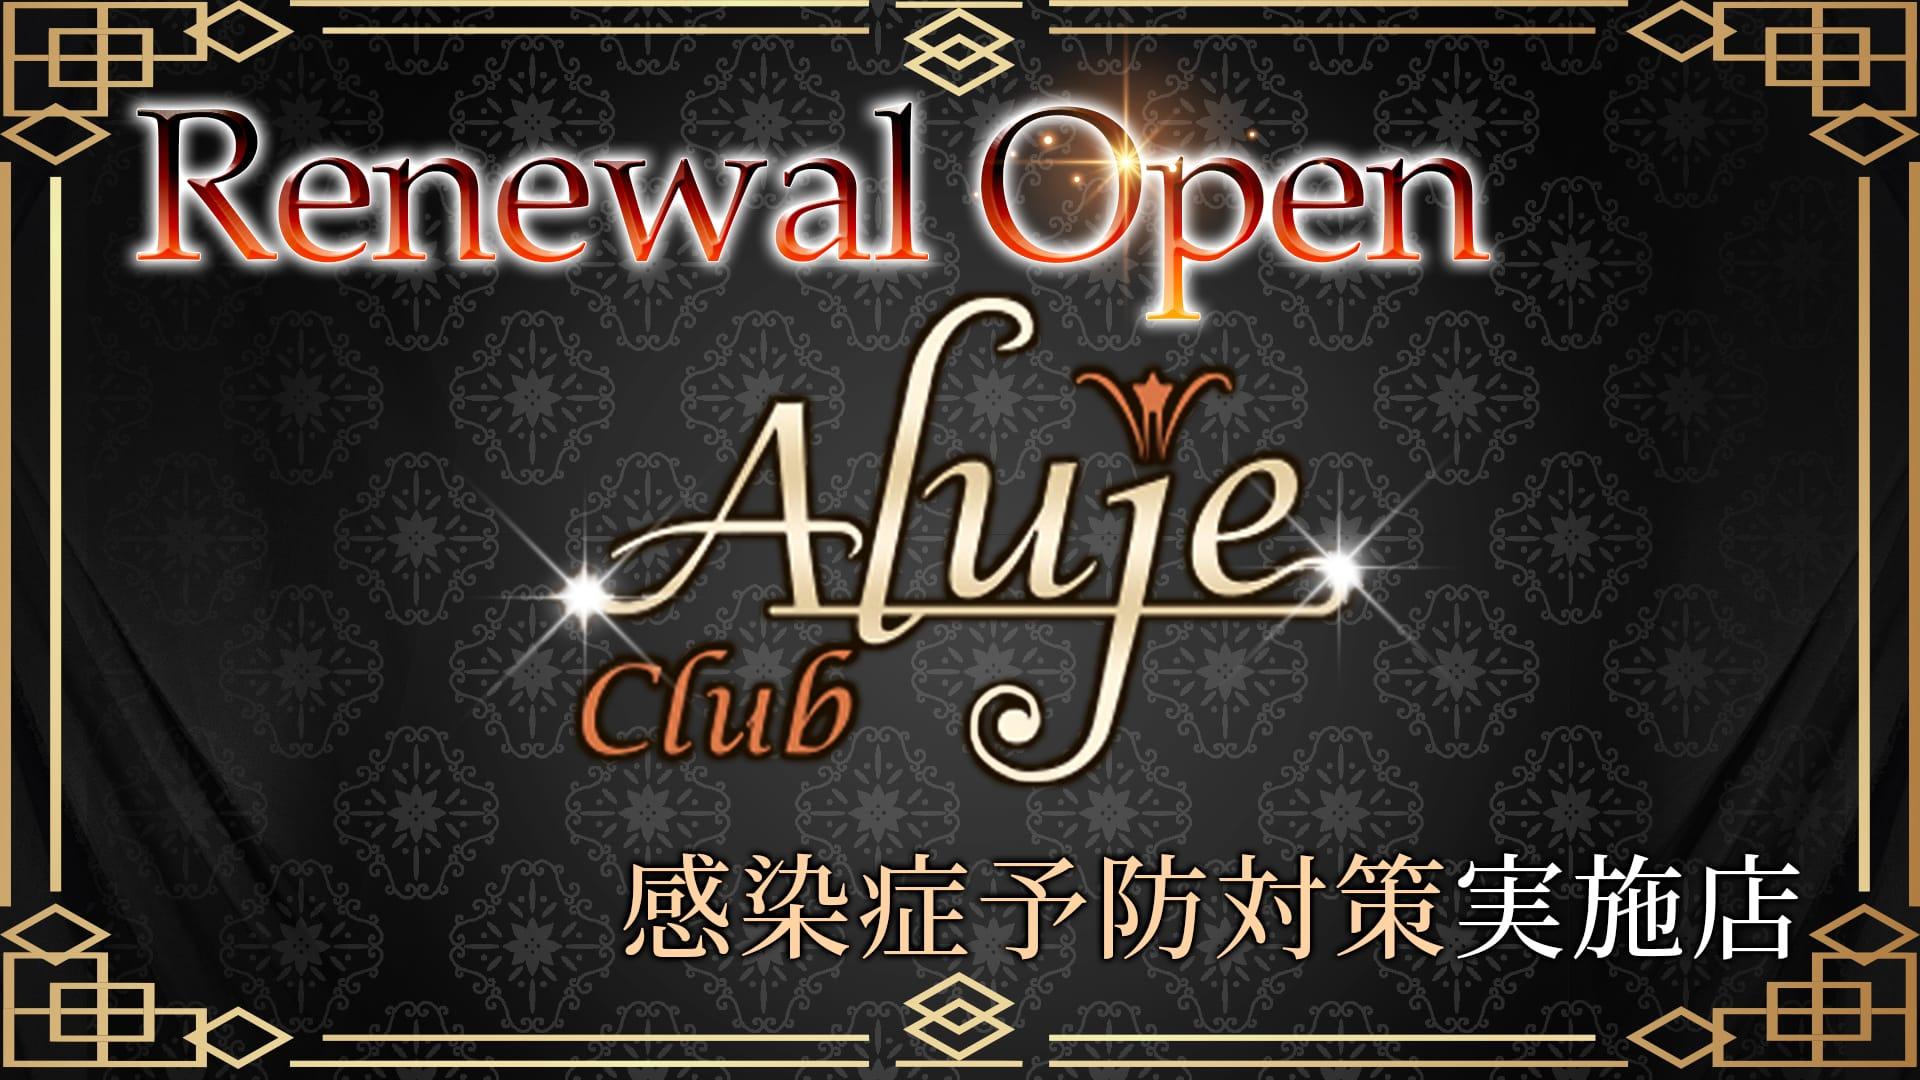 Club Aluje(アルージュ) 恵比寿キャバクラ TOP画像